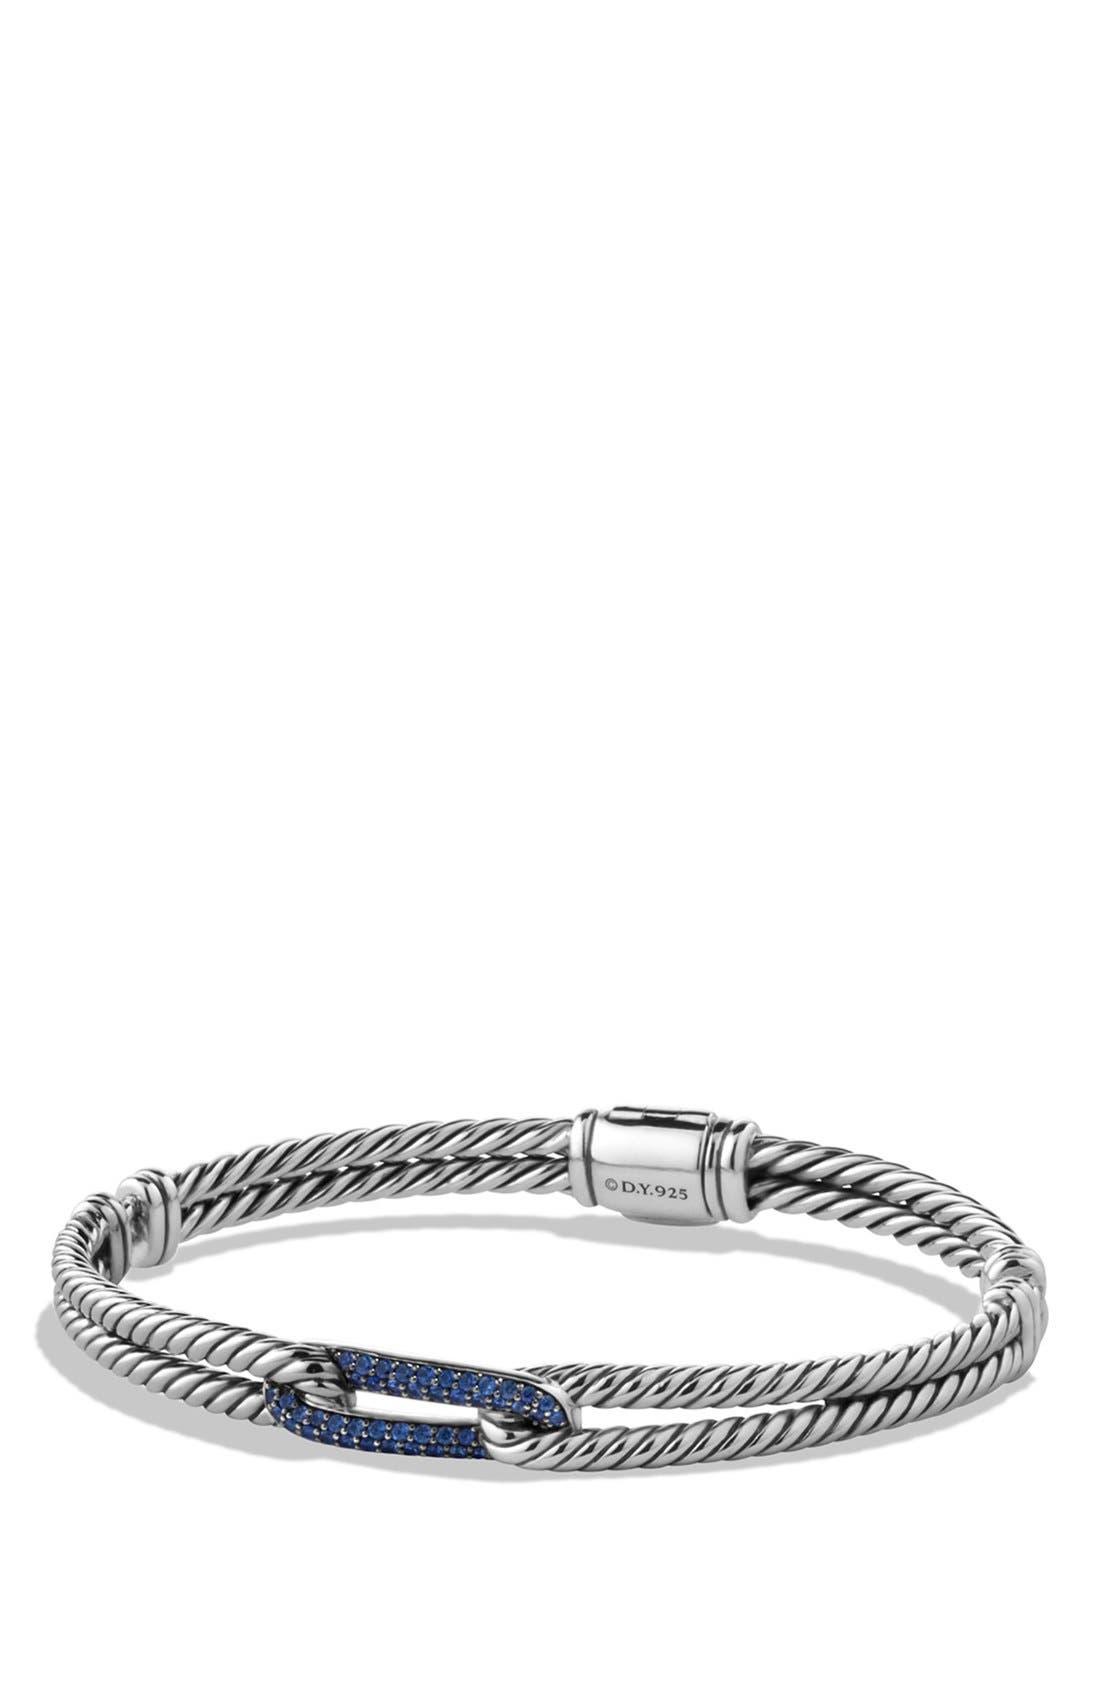 DAVID YURMAN 'Labyrinth' Petite Pavé Single-Loop Bracelet with